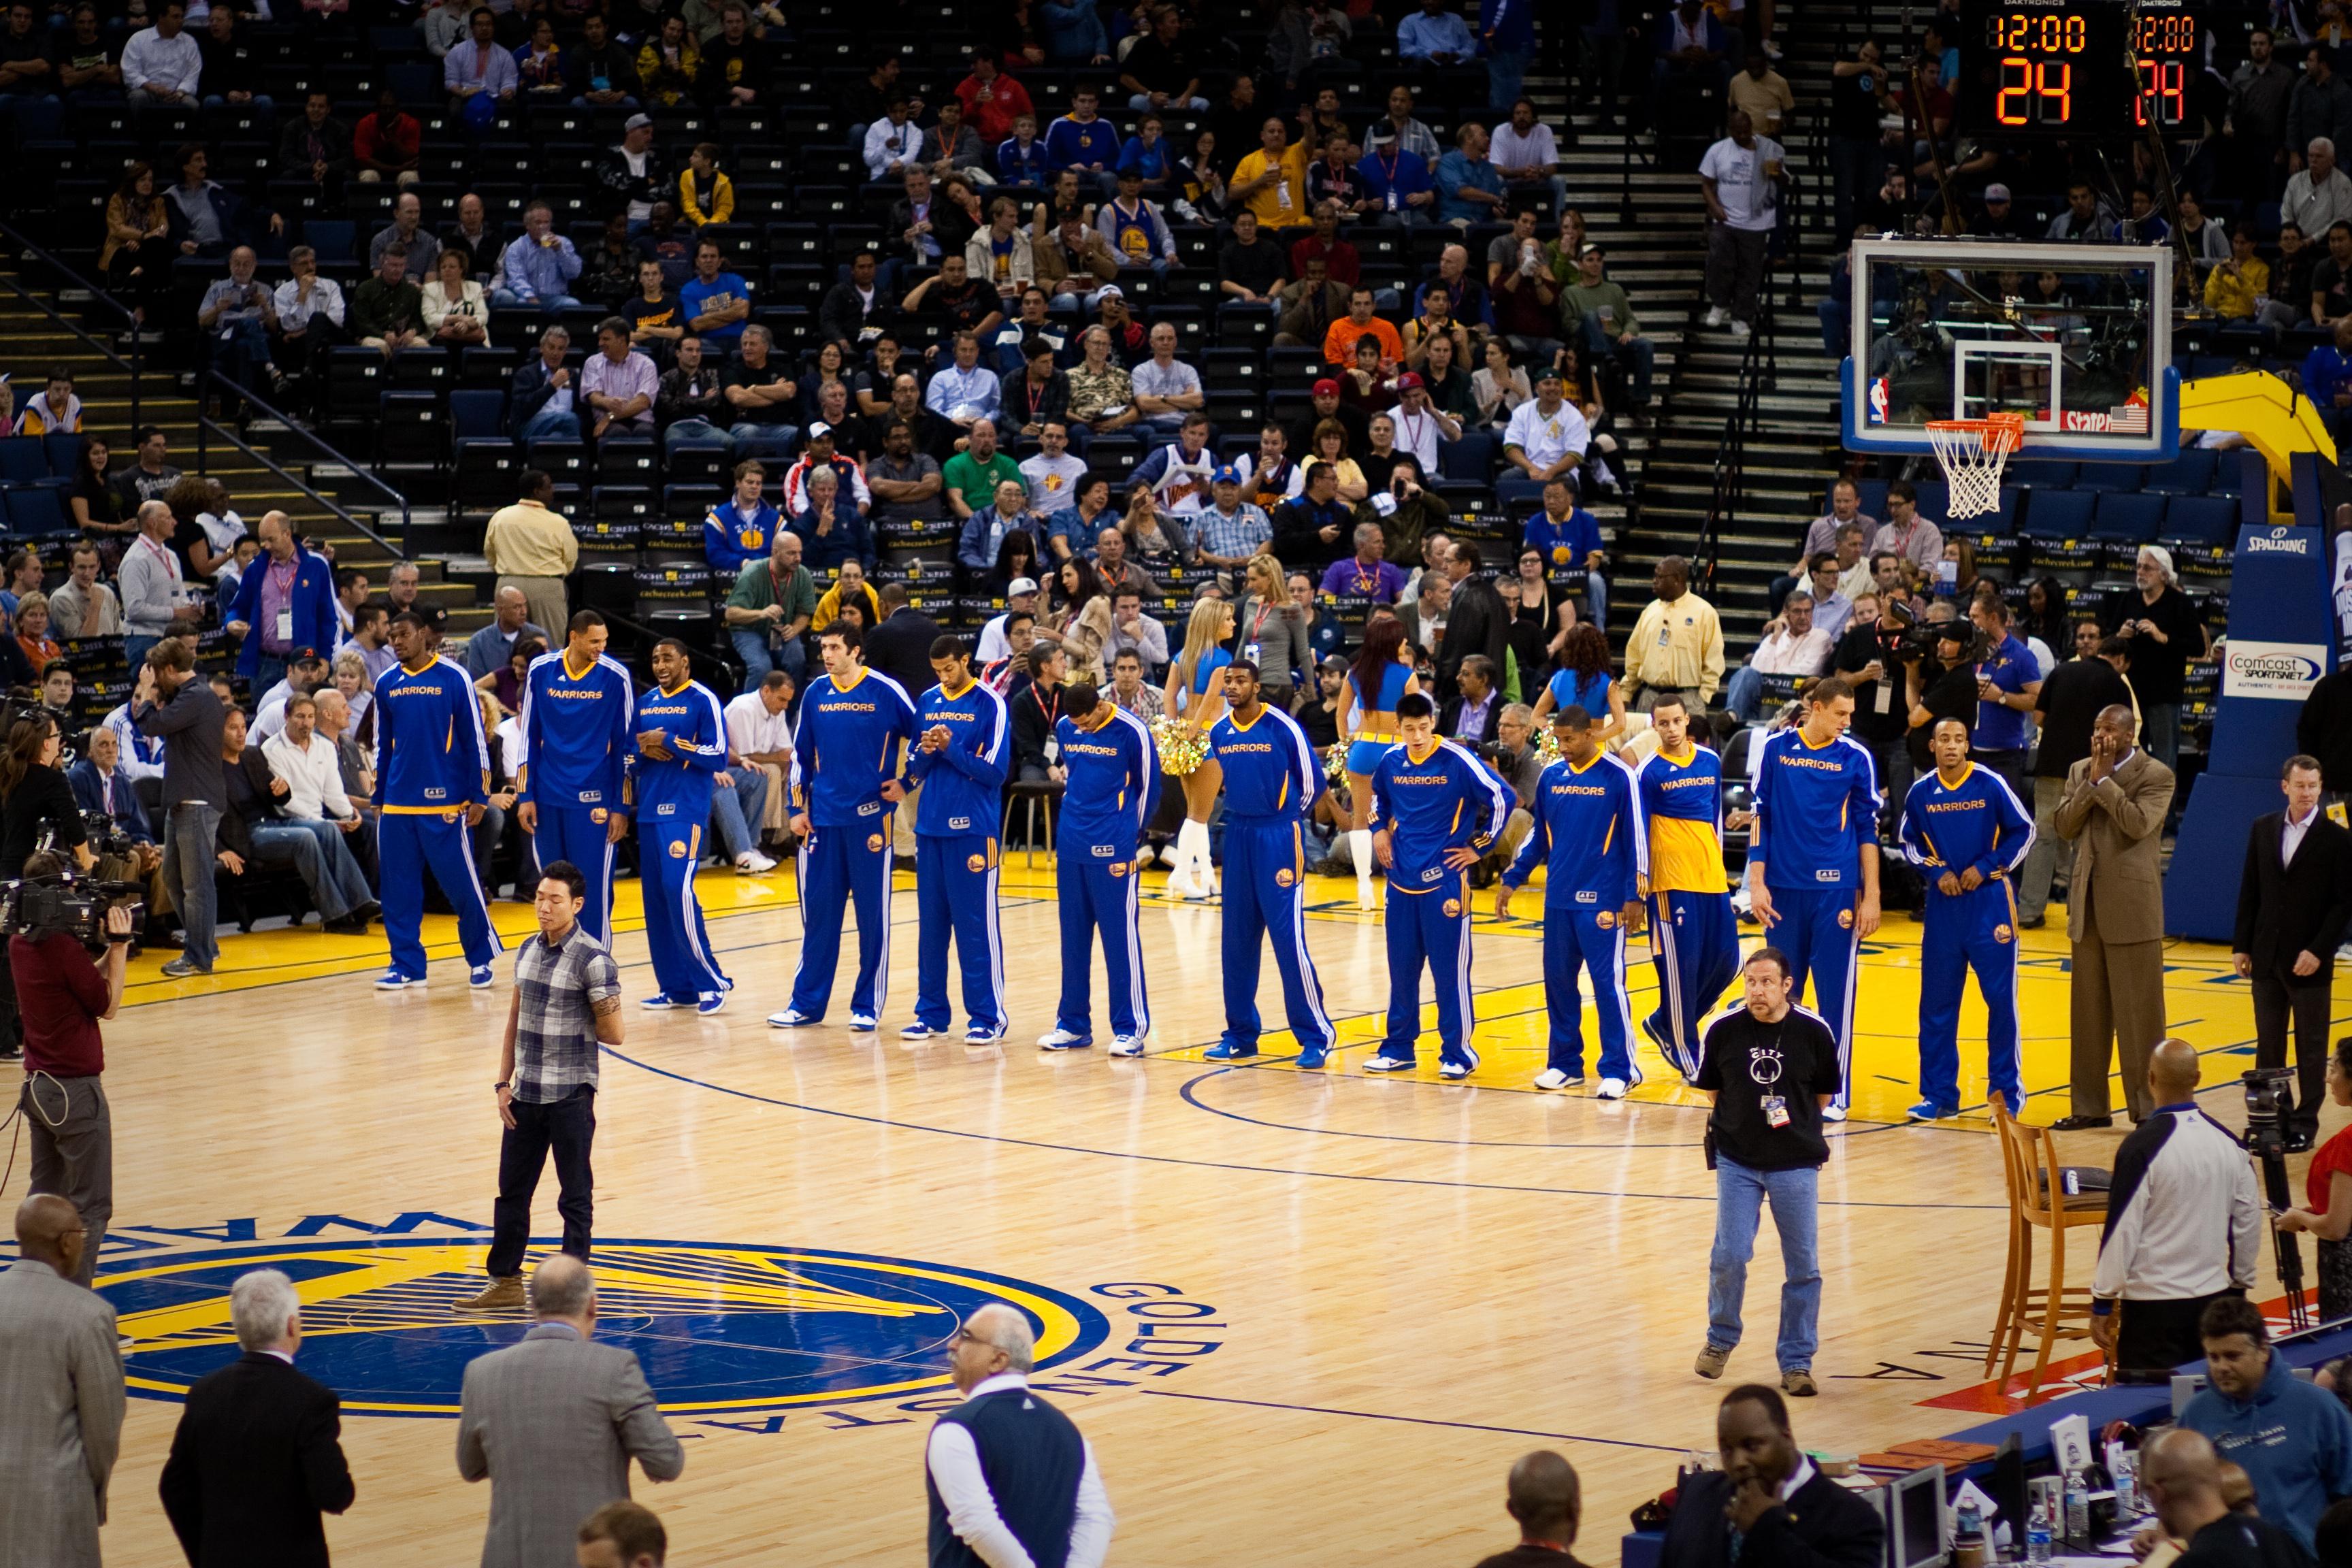 Golden State Warriors Line Up: From Left: Jeff Adrien, Dan Gadzuric, Reggie Williams, Vladimir Radmanović, Brandan Wright, Rodney Carney, Dorrell Wright, Jeremy Lin, Charlie Bell, Stephen Curry, Andris Biedriņš, and Monta Ellis